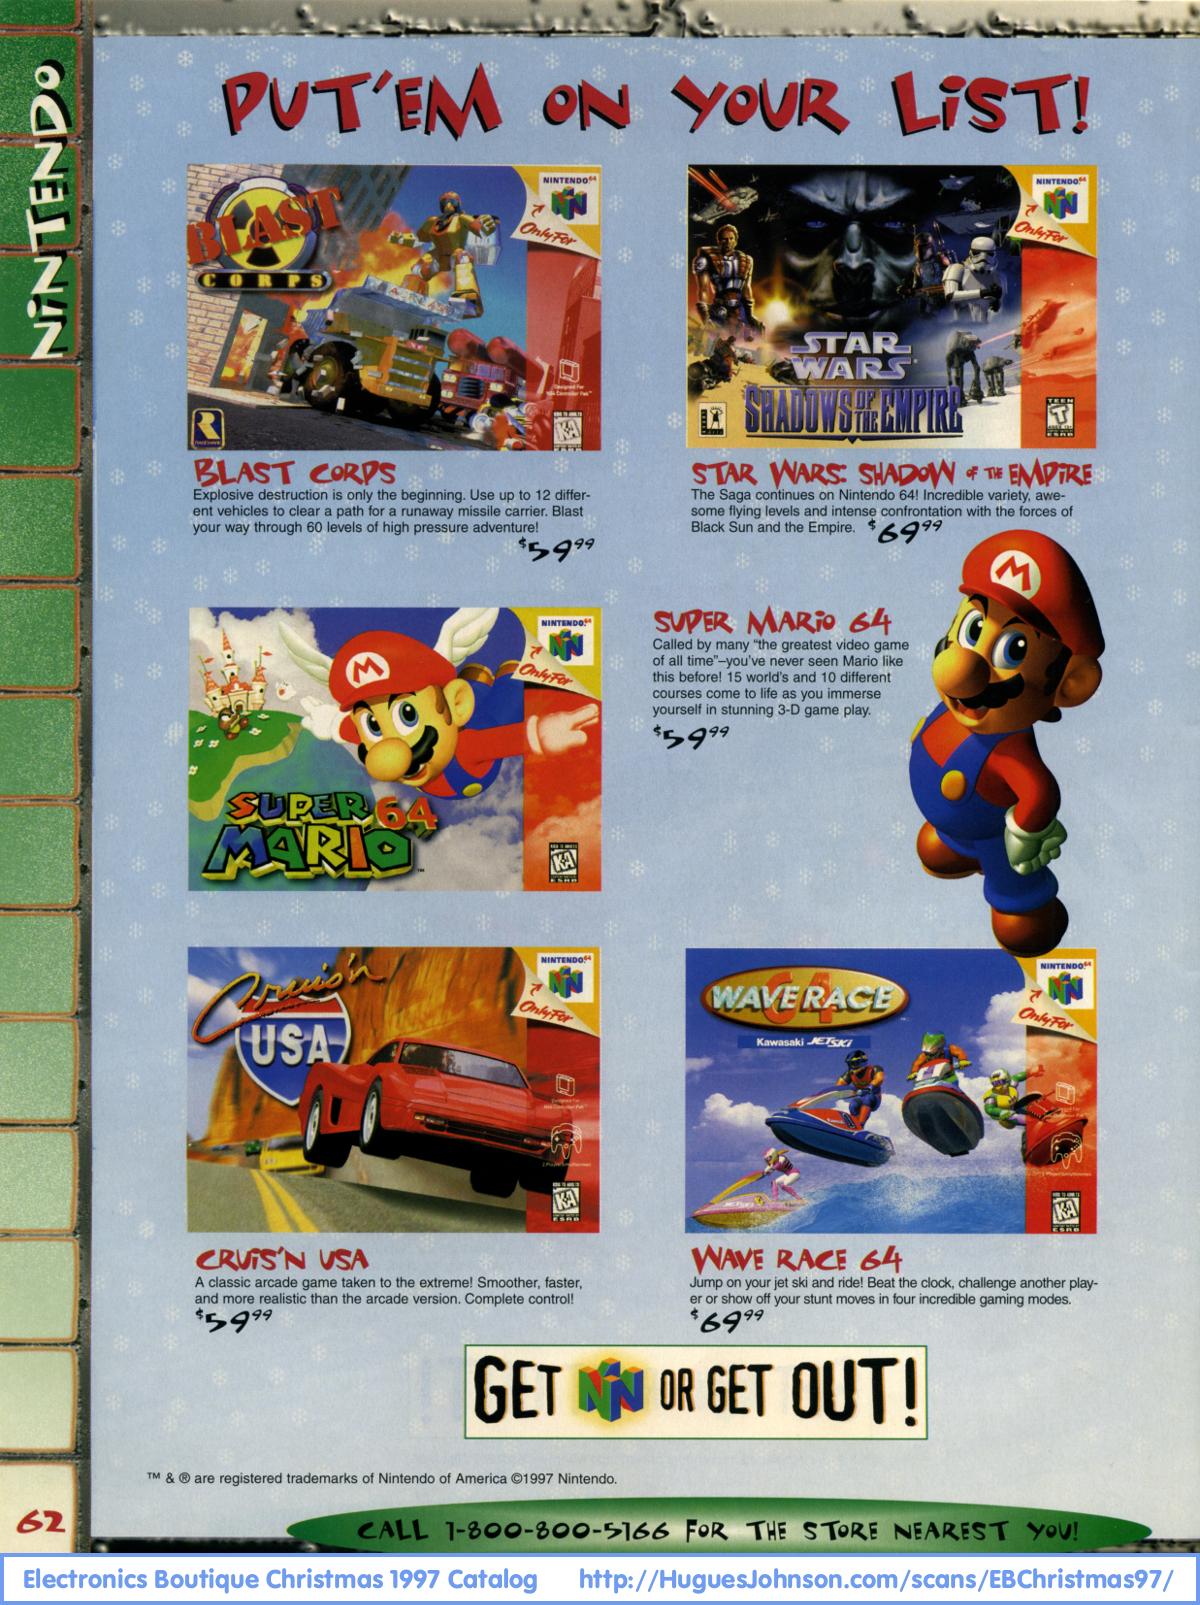 HuguesJohnson.com - Electronics Boutique Christmas 1997 Catalog ...